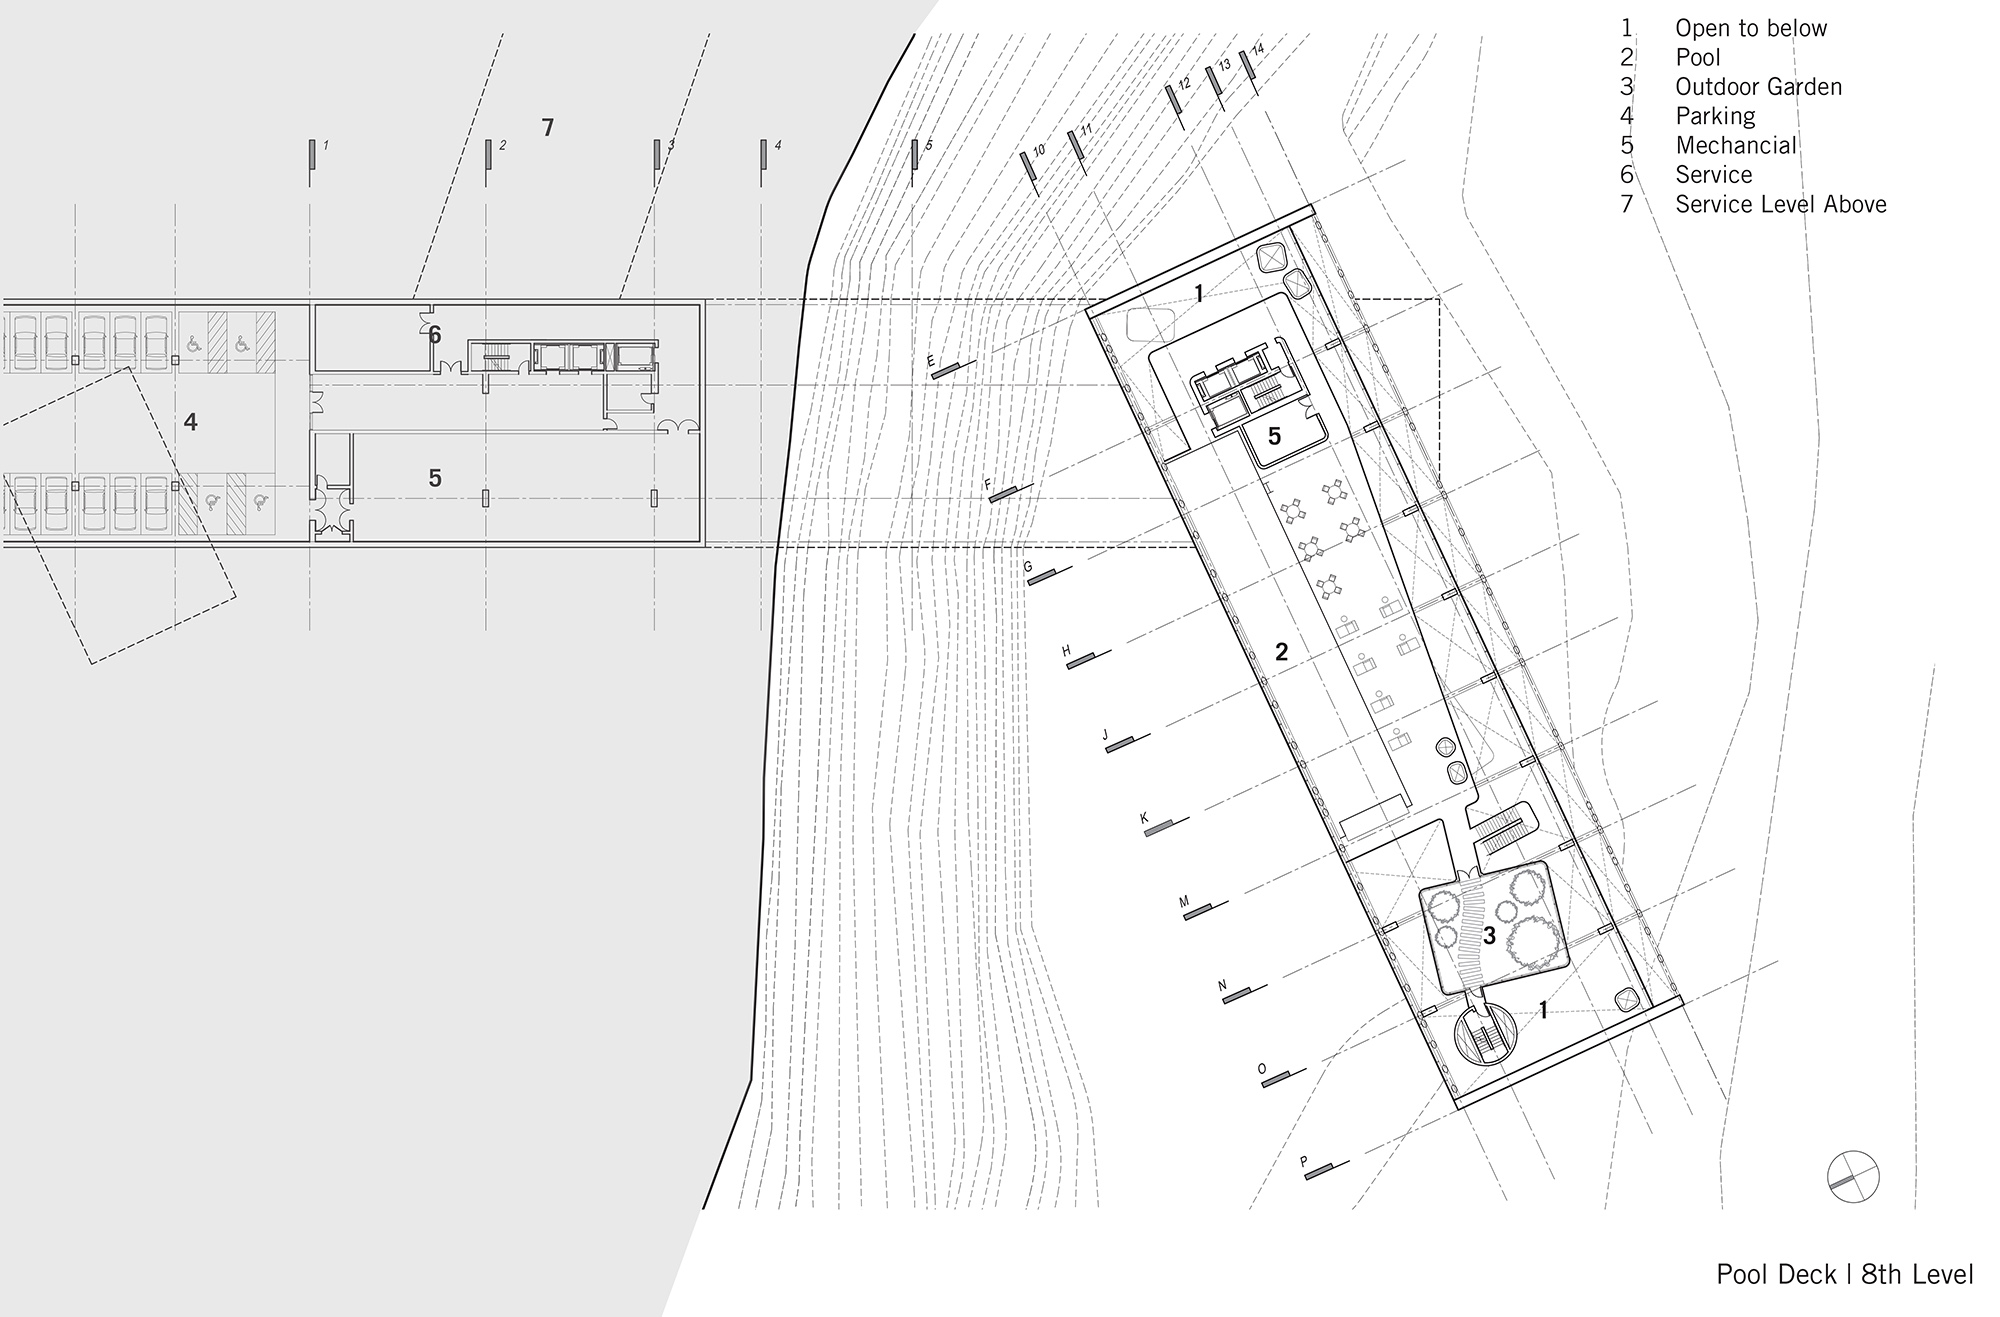 Plan - Pool Deck Level }